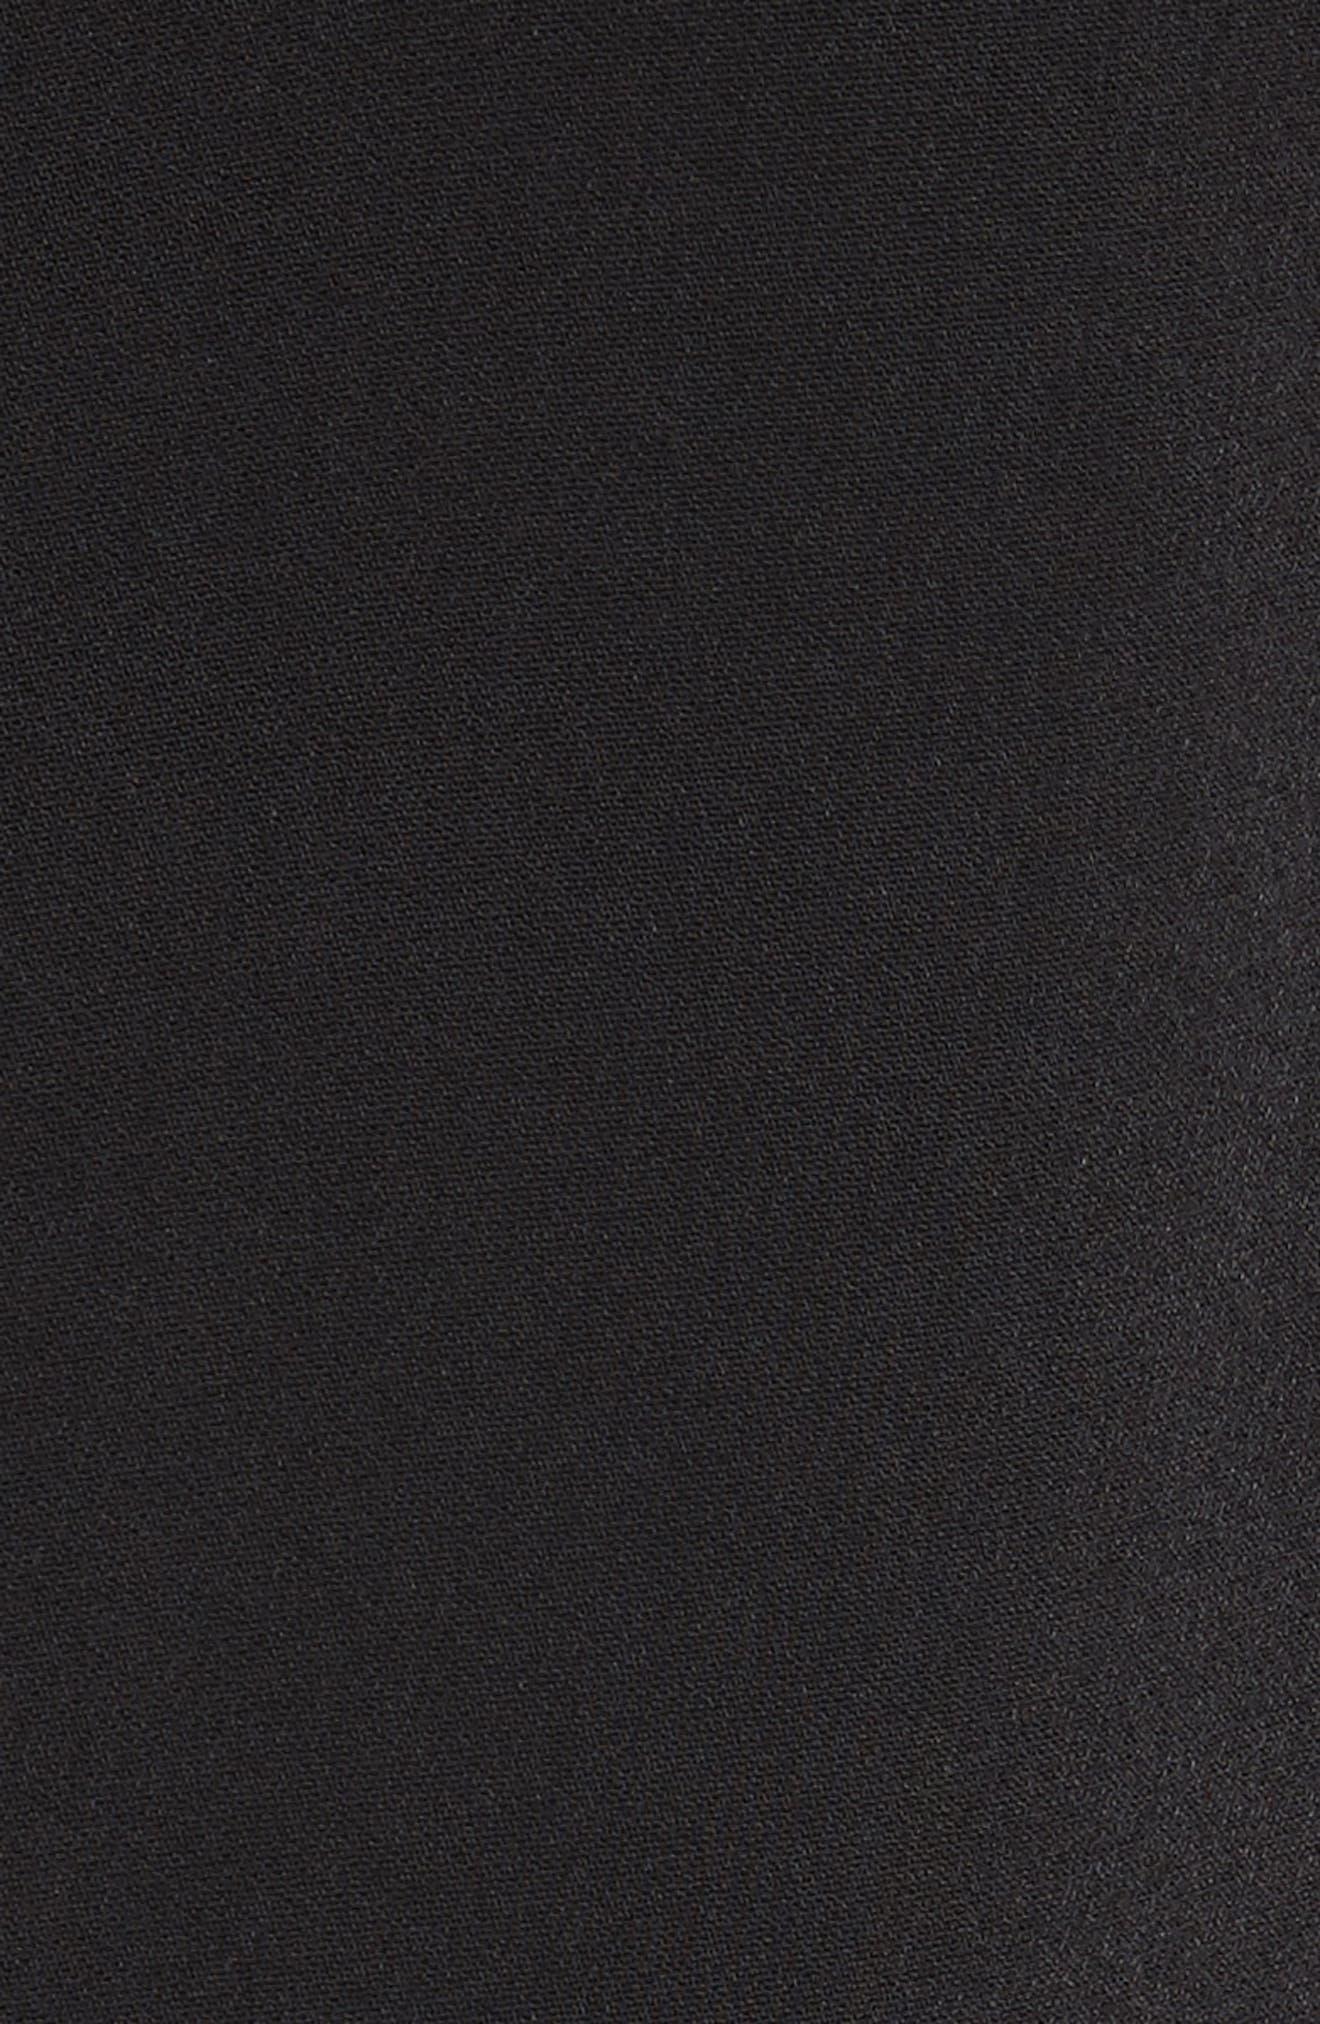 Siiara Frill Cold Shoulder Shift Dress,                             Alternate thumbnail 5, color,                             001